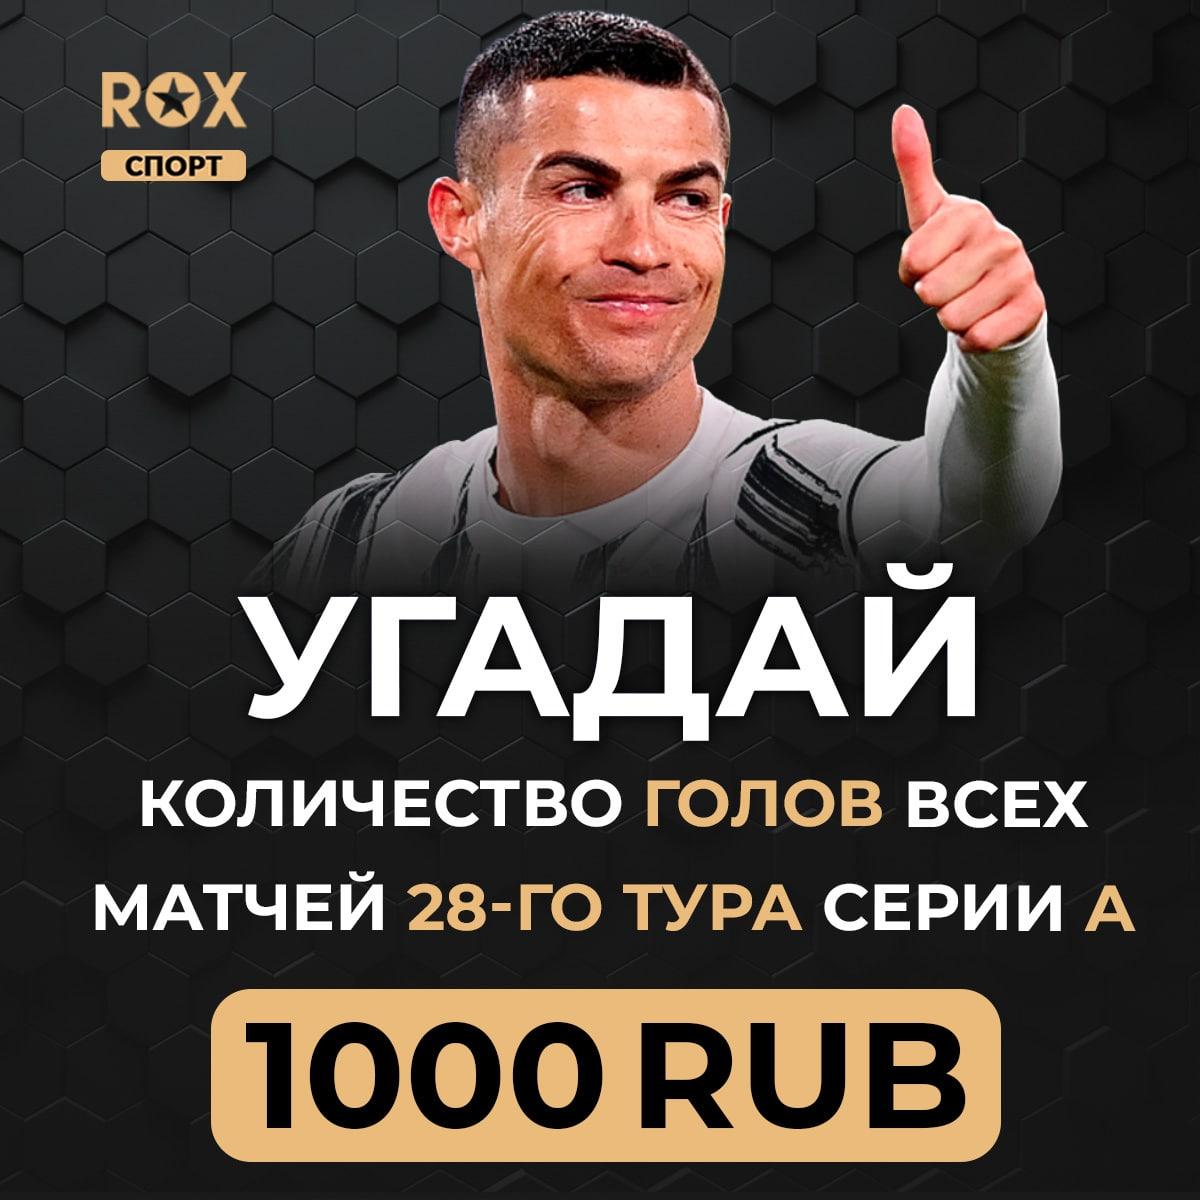 rox casino 20. bet – VIP Casino – Profile – MediaArtHistories Forum